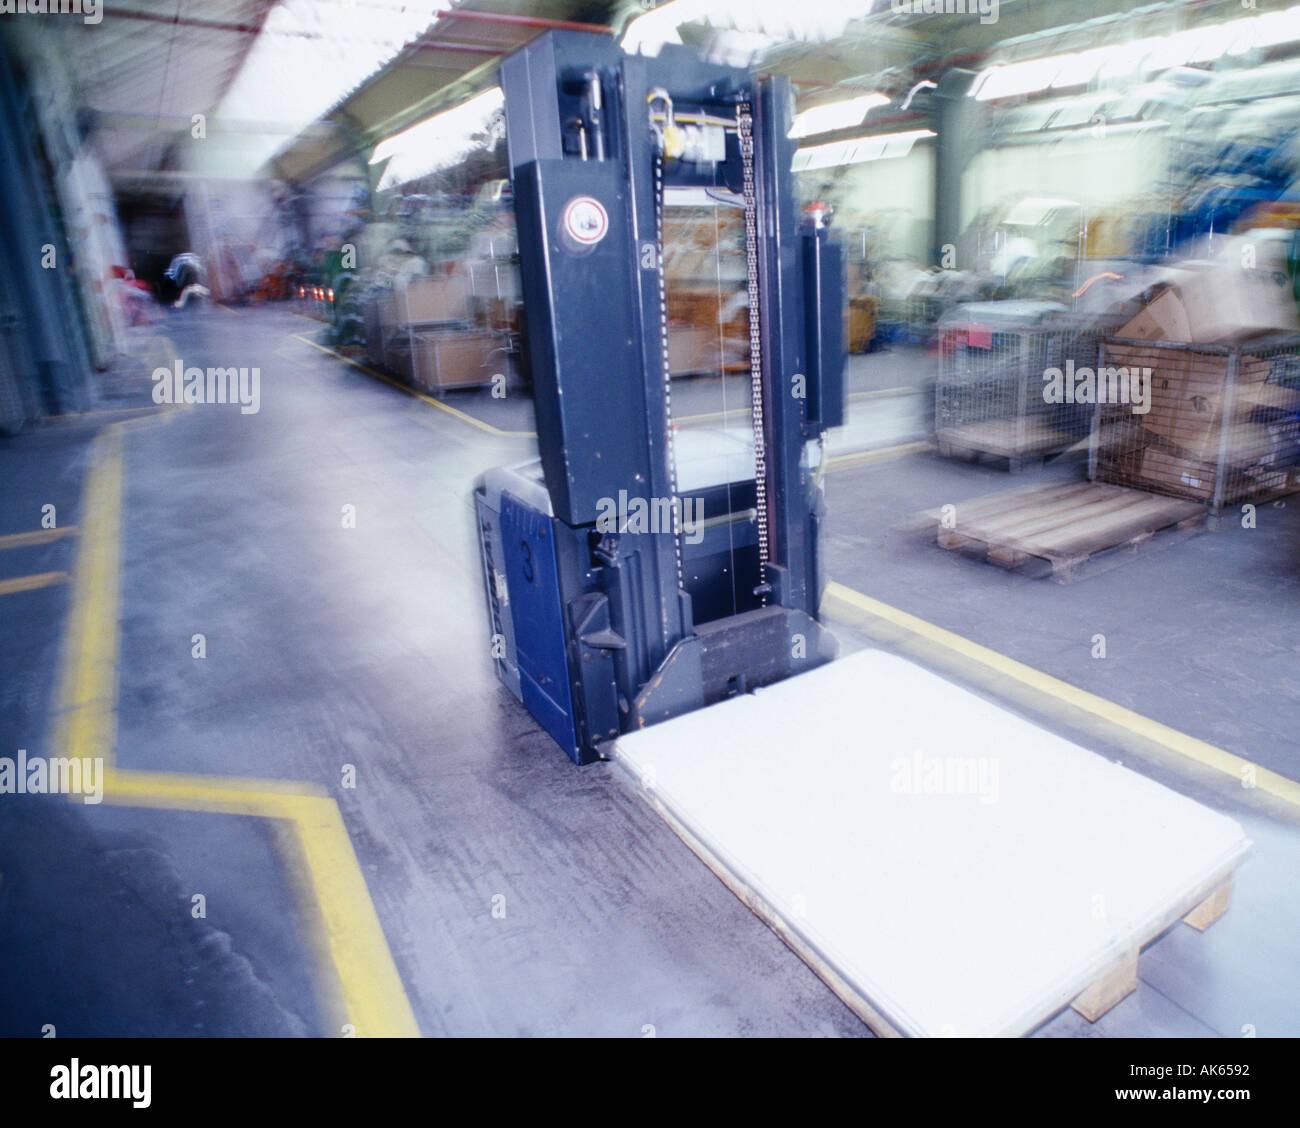 Robot forklift truck in warehouse Hannover Lower Saxony Germany Roboter Gabelstapler in Lagerhalle Hannover Niedersachsen Stock Photo